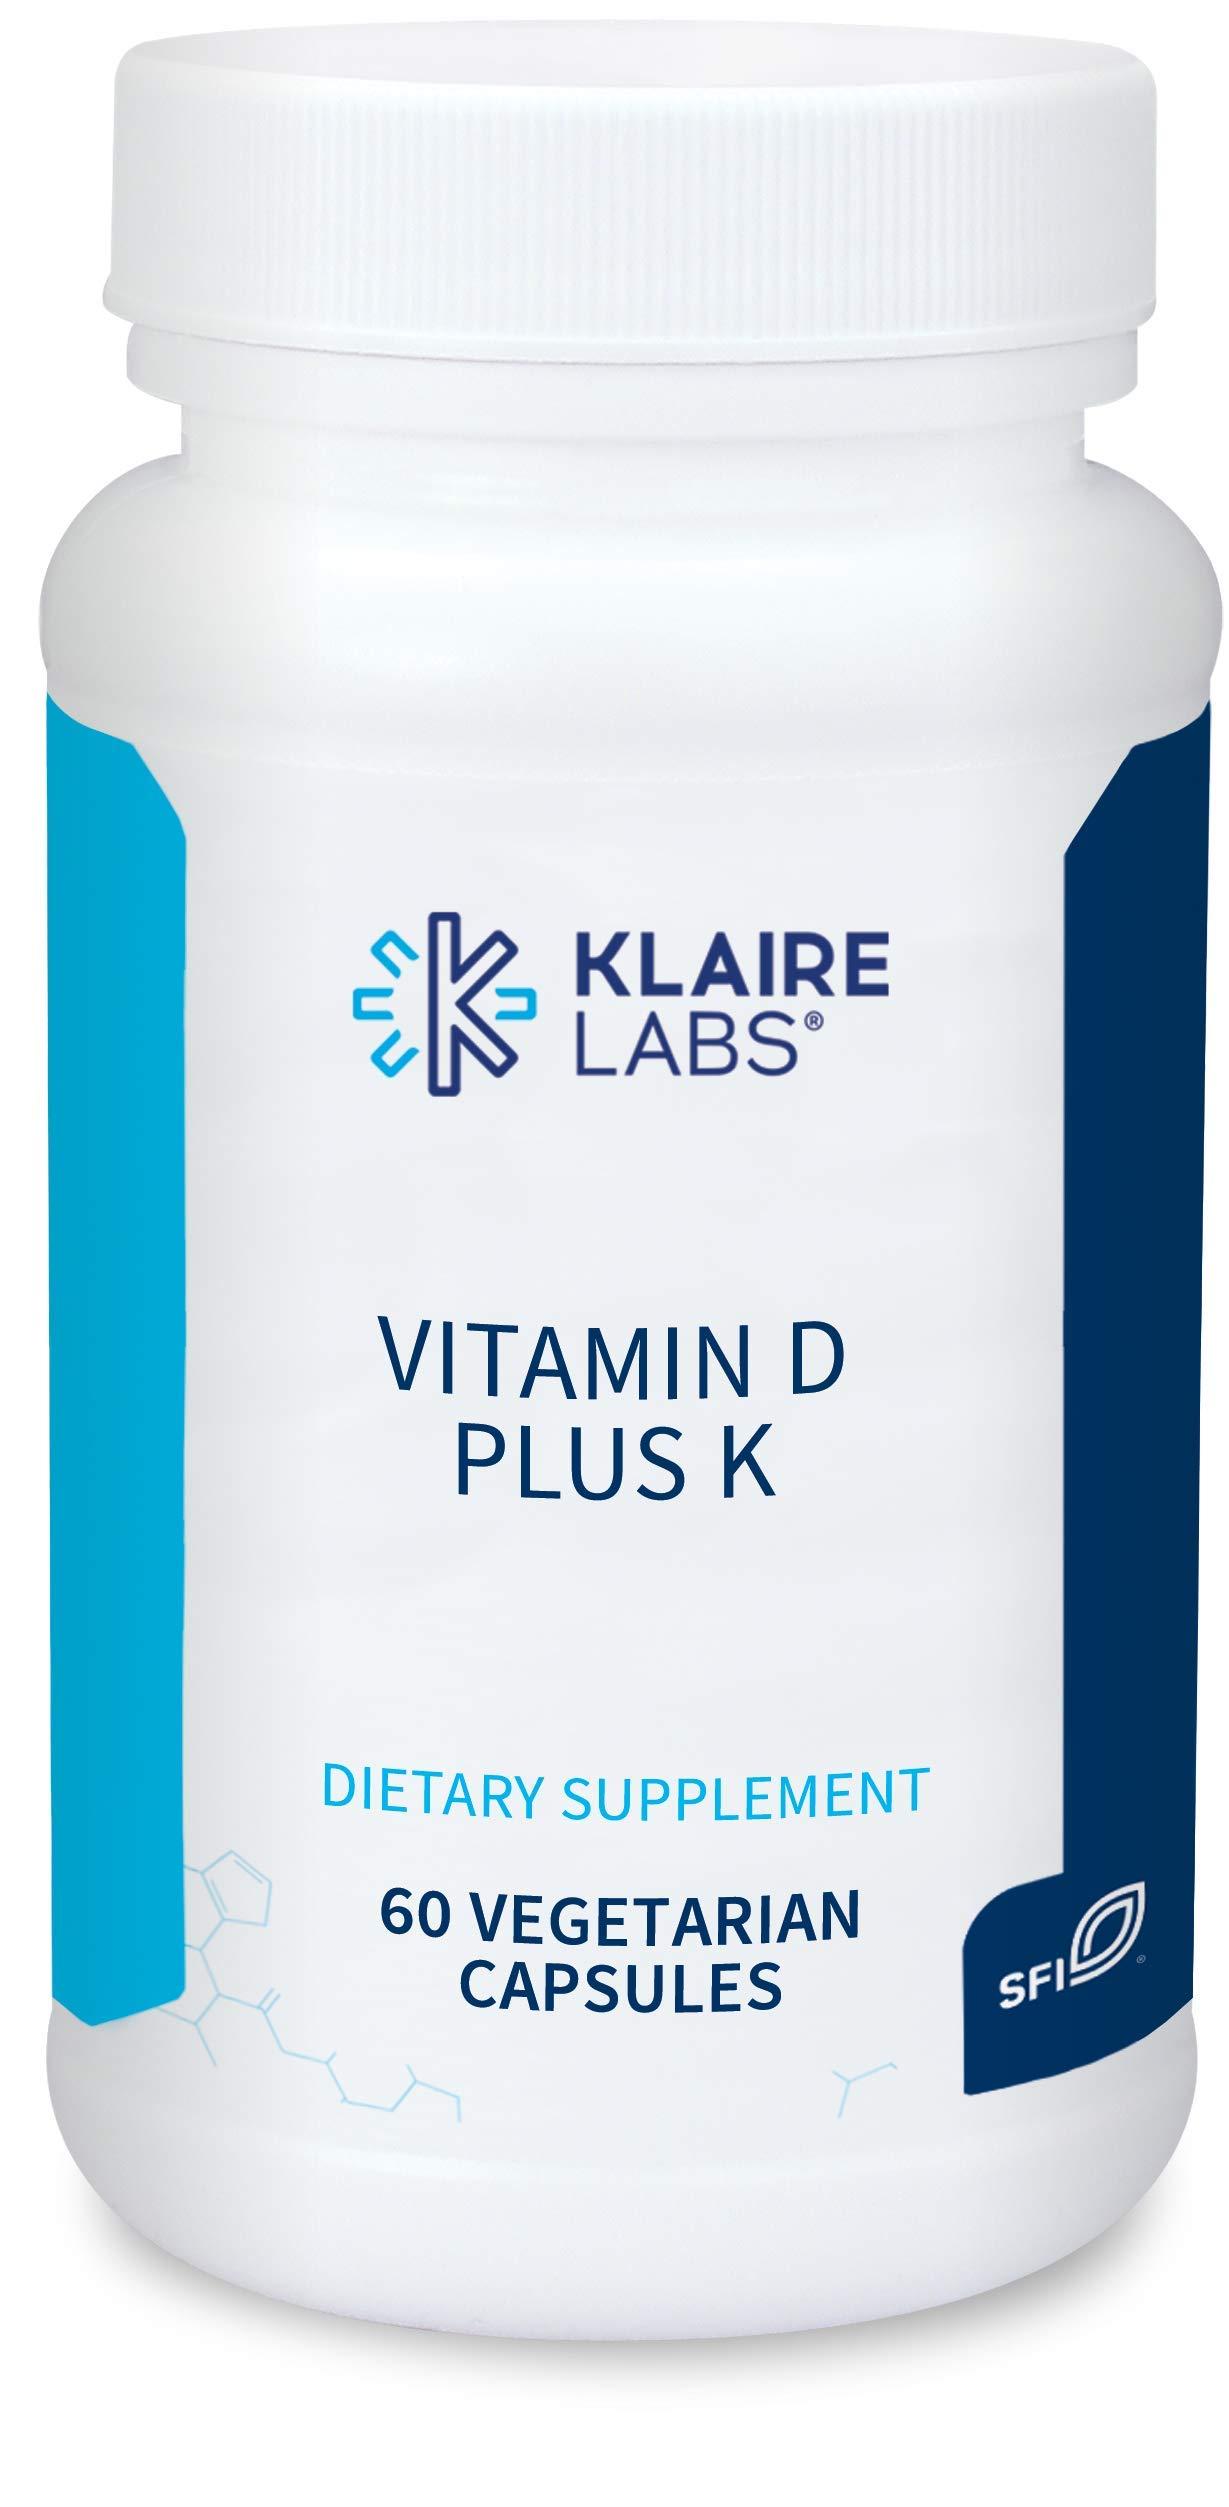 Klaire Labs Vitamin D Plus K - 5000 IU Vitamin D3 with Vitamin K2 MK-7, Bioavailable Formula for Bone, Cardiovascular & Immune Support (60 Capsules)